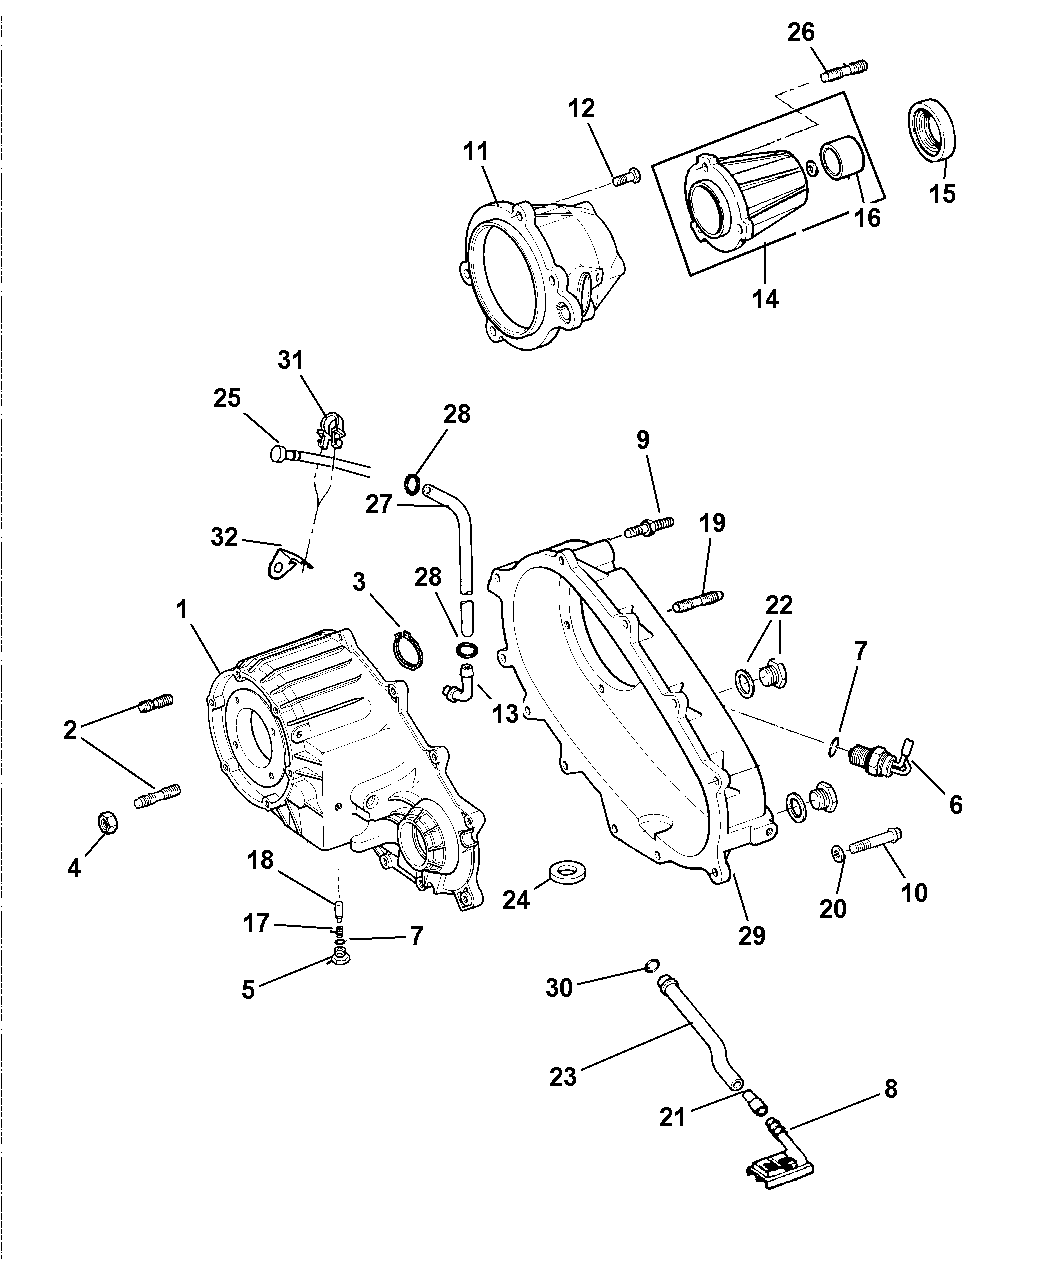 1997 Dodge Dakota Case & Related Parts of Transfer Case Model